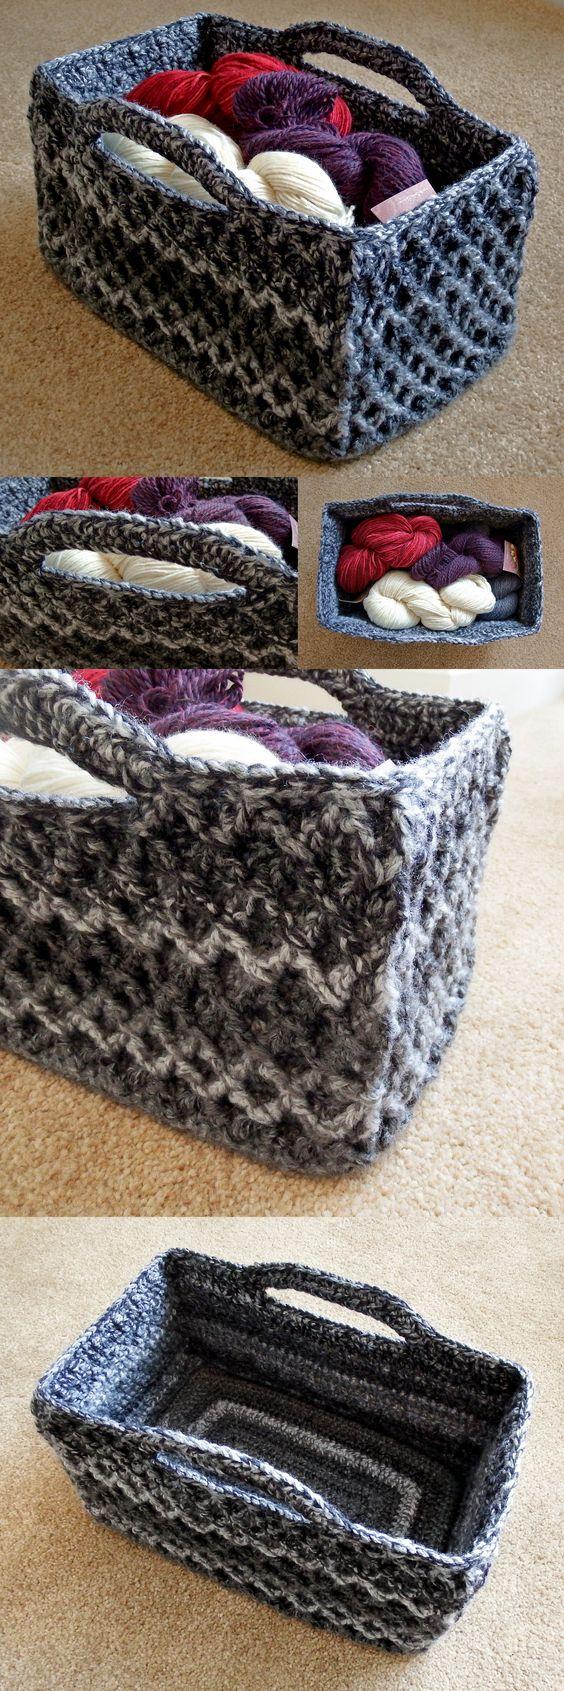 Heart Blanket Crochet Patterns Free and Paid  |Diamond Trellis Pattern Red Heart